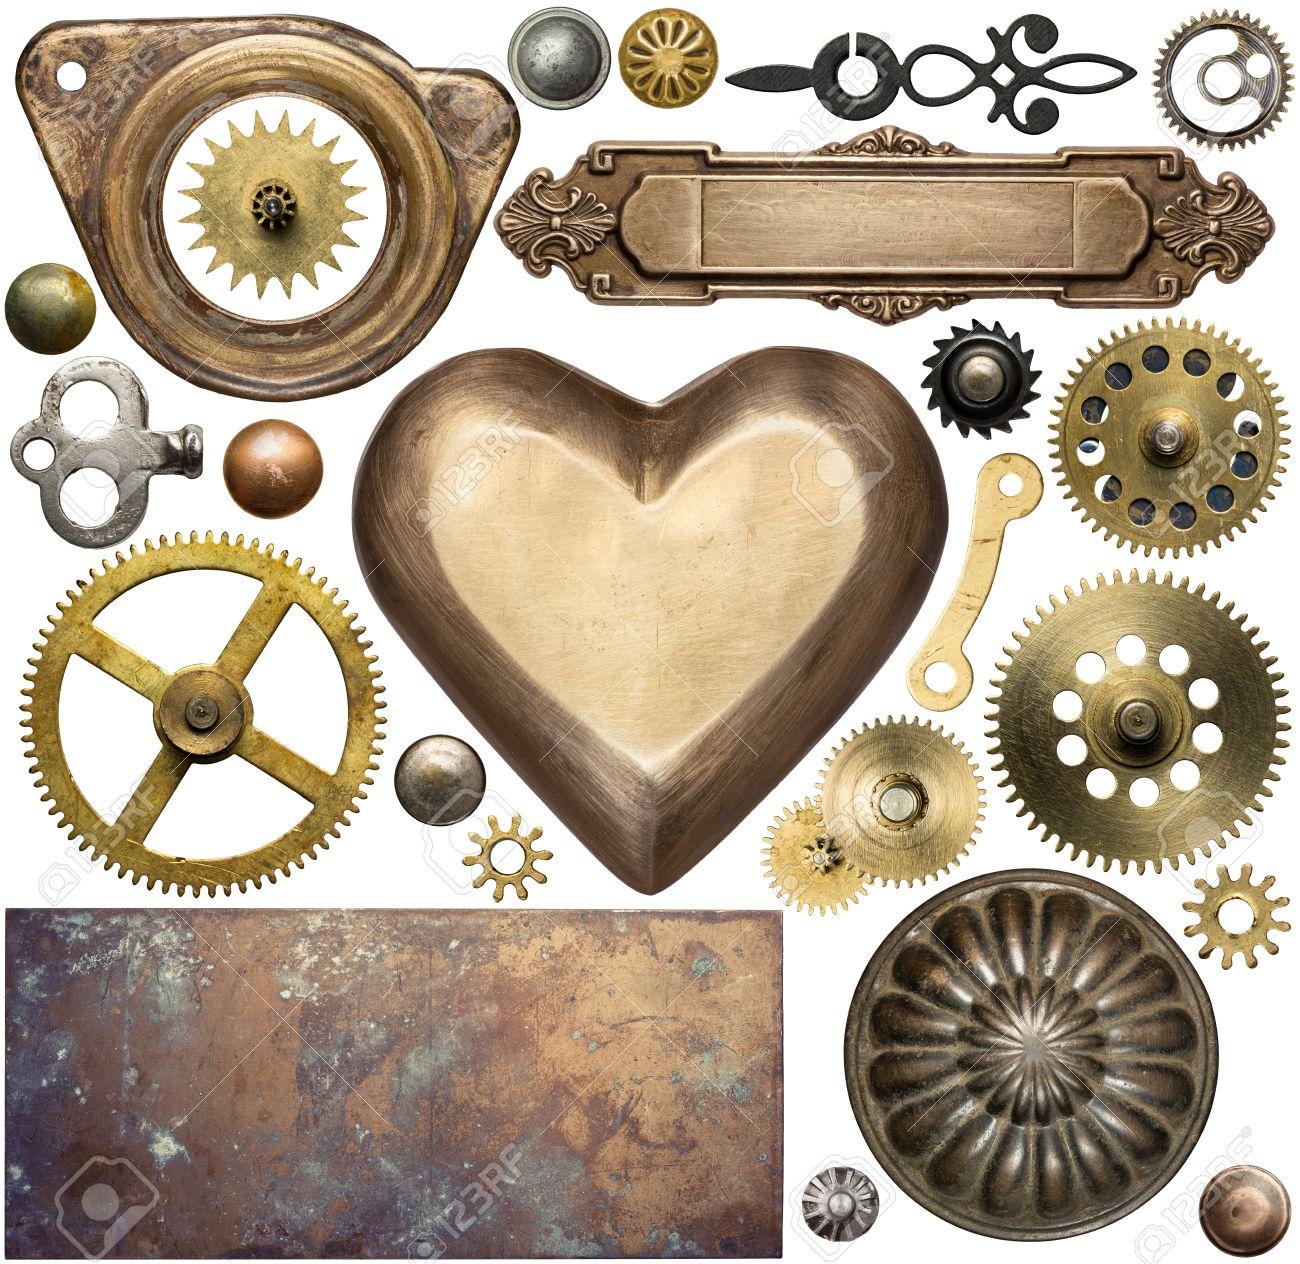 Vintage metal details, textures, clock gears. Steampunk design elements. Stock Photo - 44384805